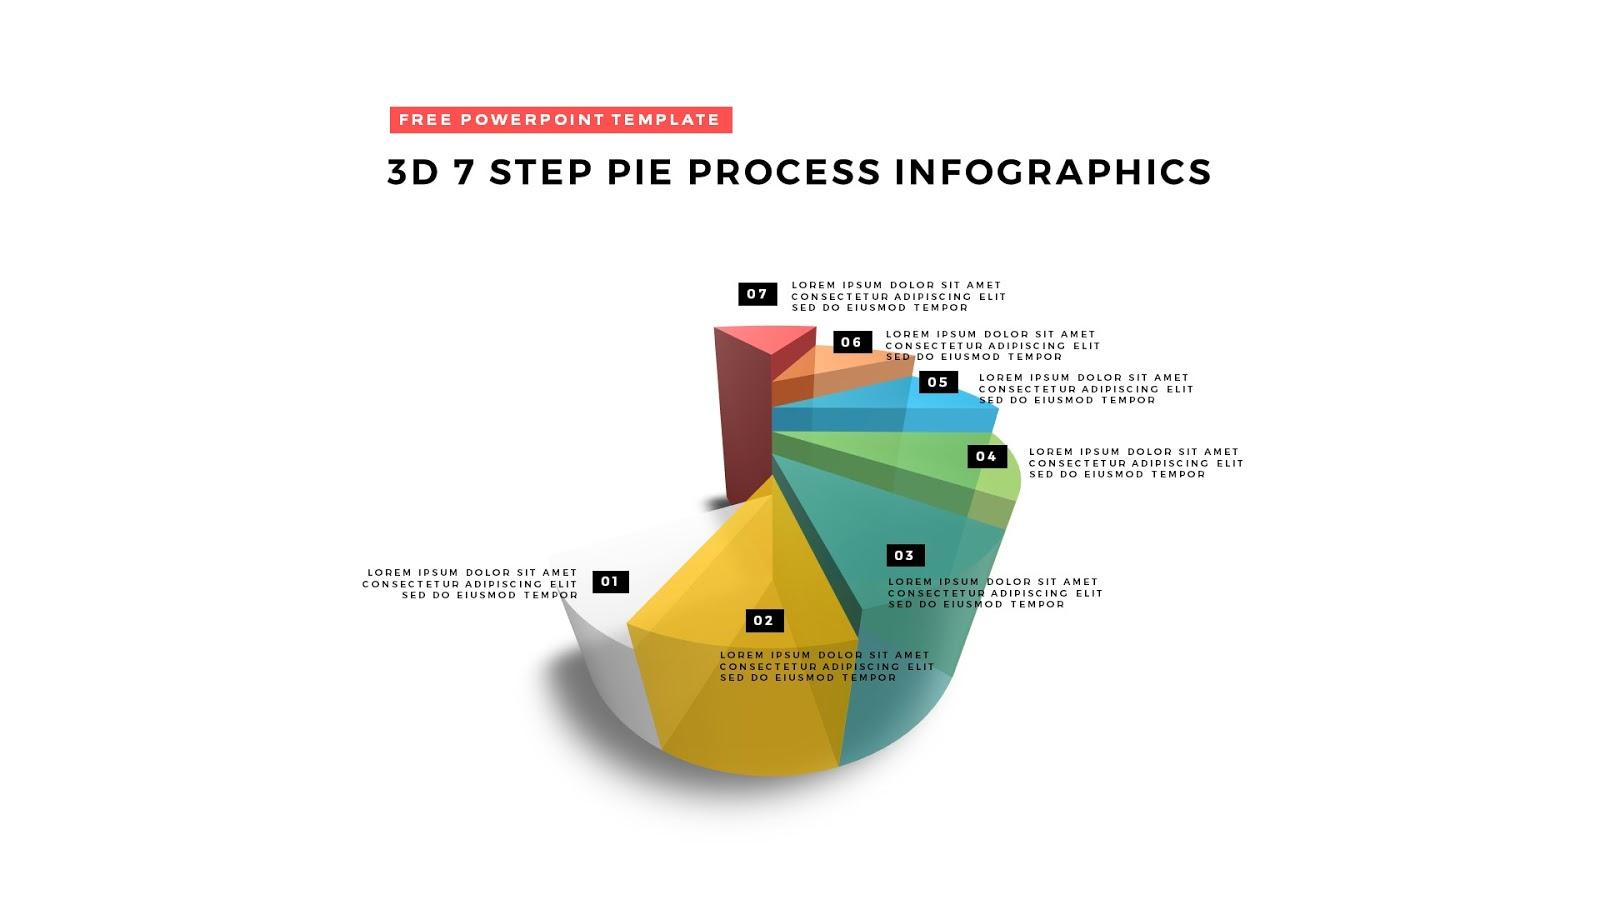 3d pie chart design elements for powerpoint templates